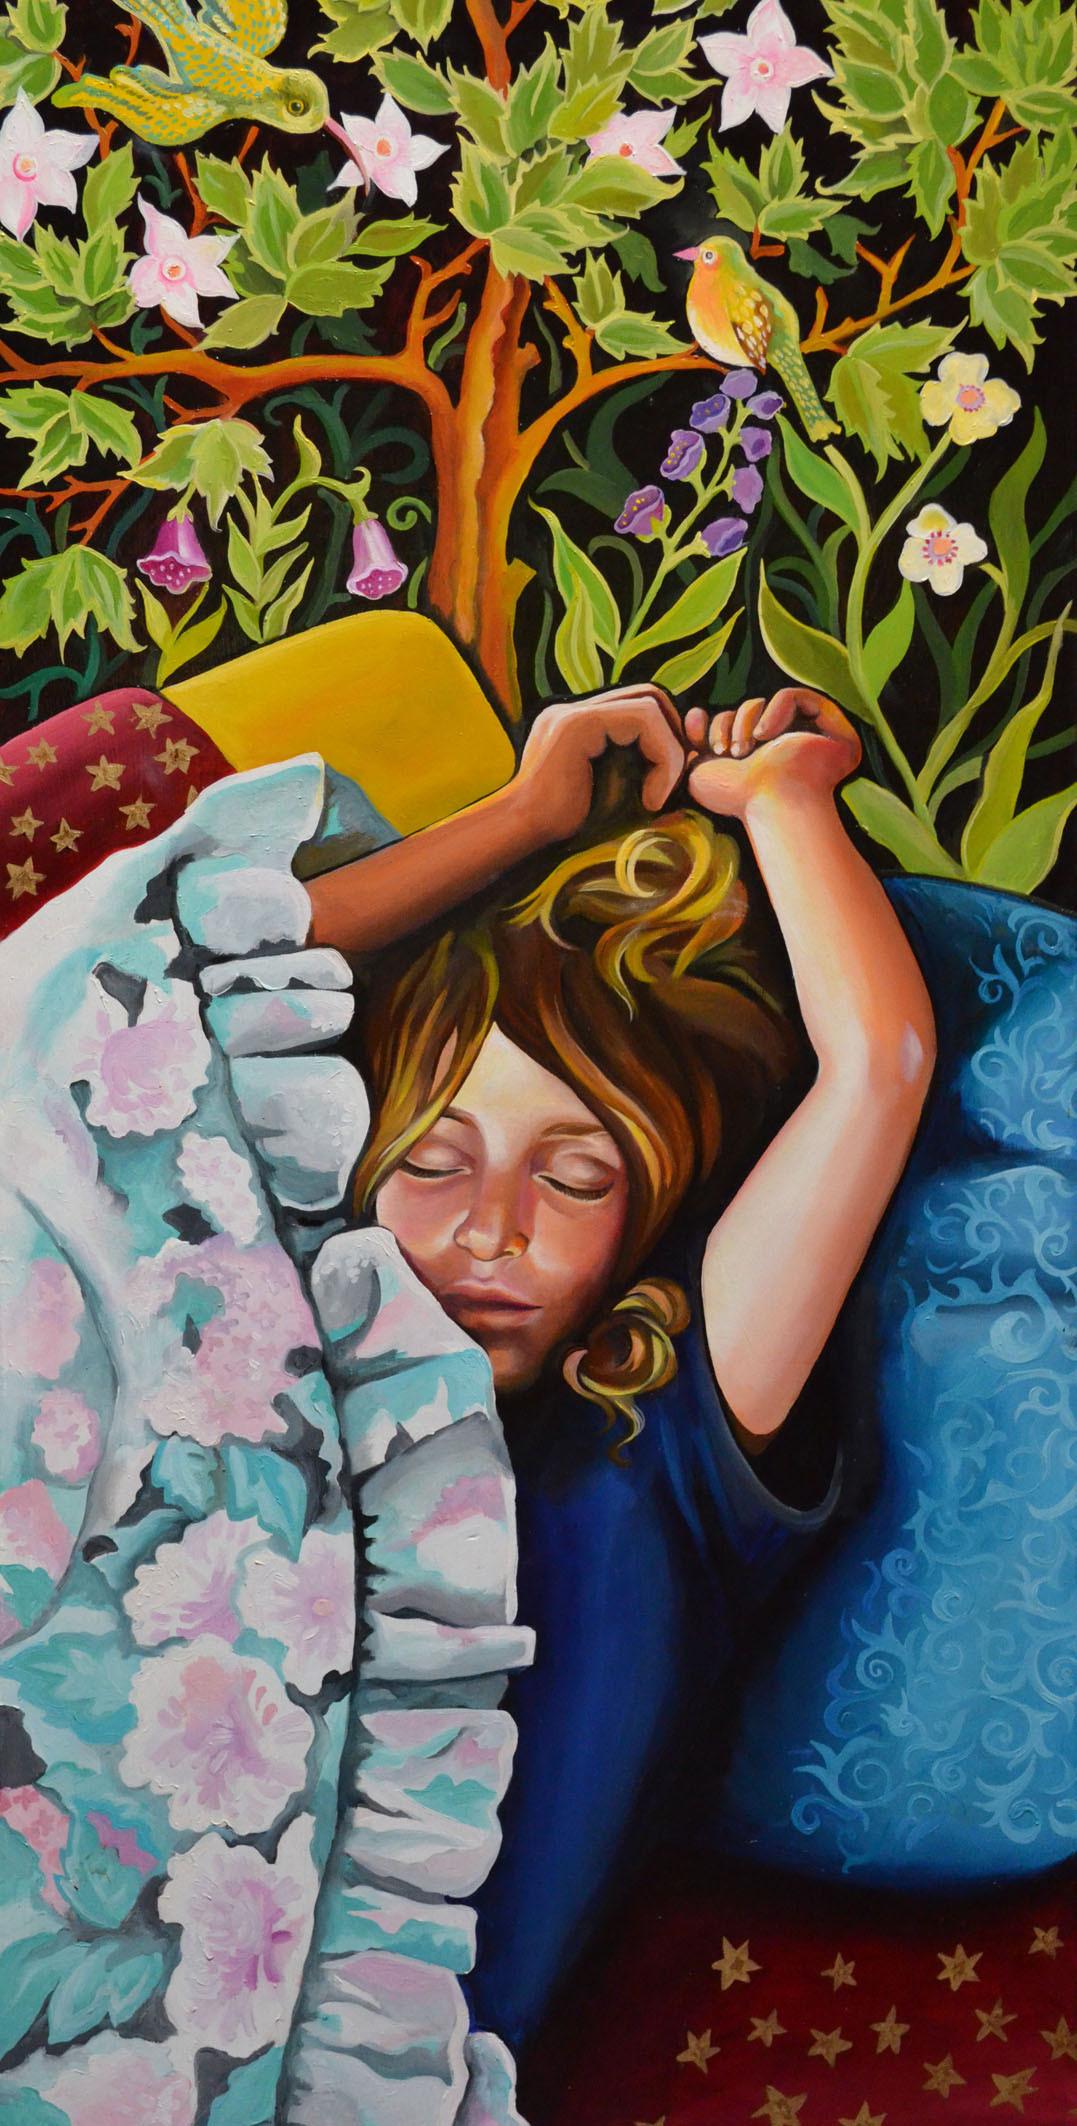 Aviv sleeping